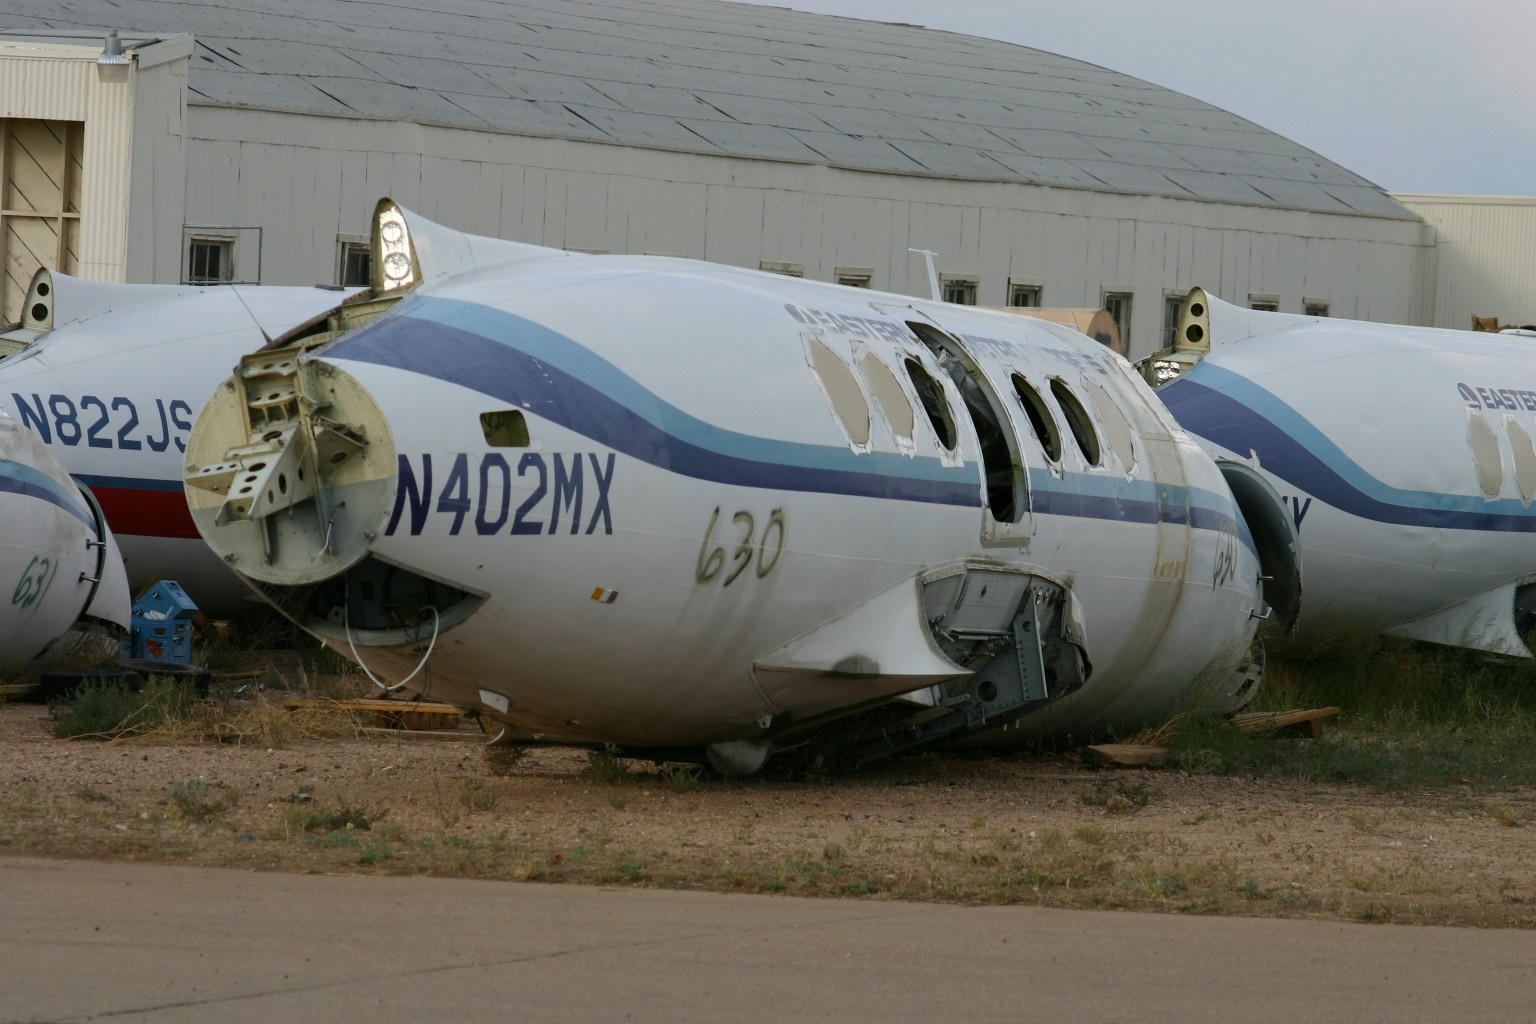 File:N402MX BAe Jetstream 31 Ex -- Eastern Metro Express (8392212720